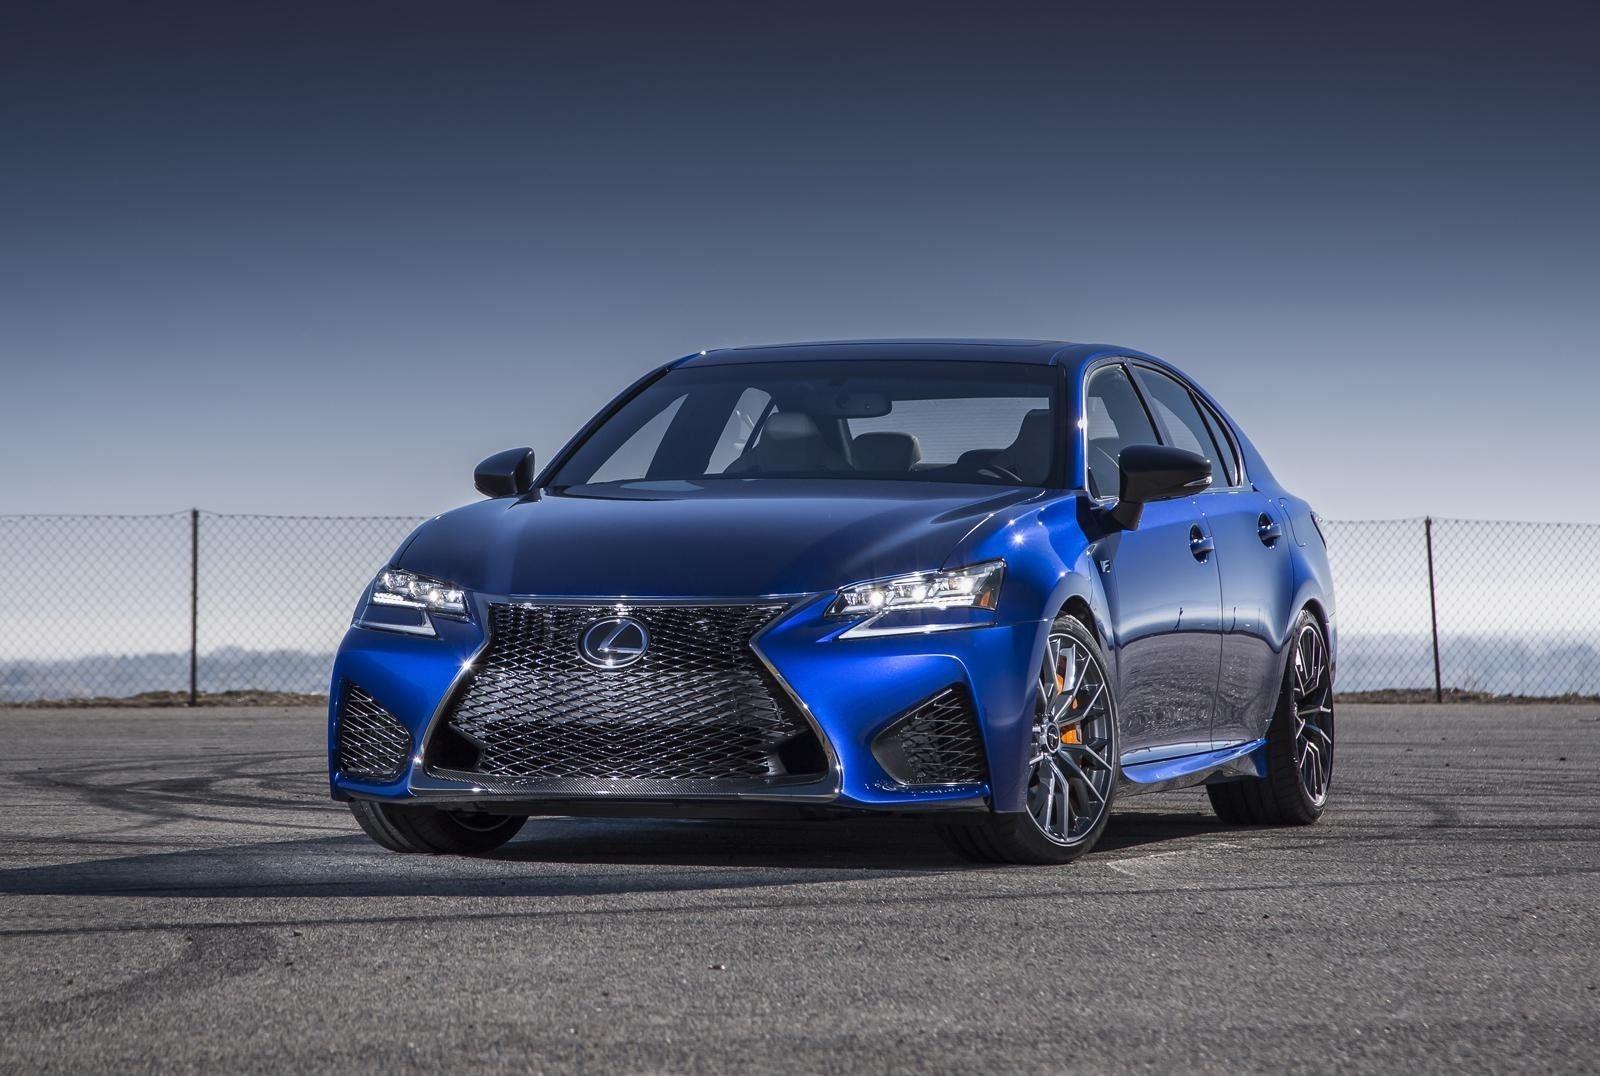 2019 Lexus Gs 350 F Sport Interior Lexus, Best new cars